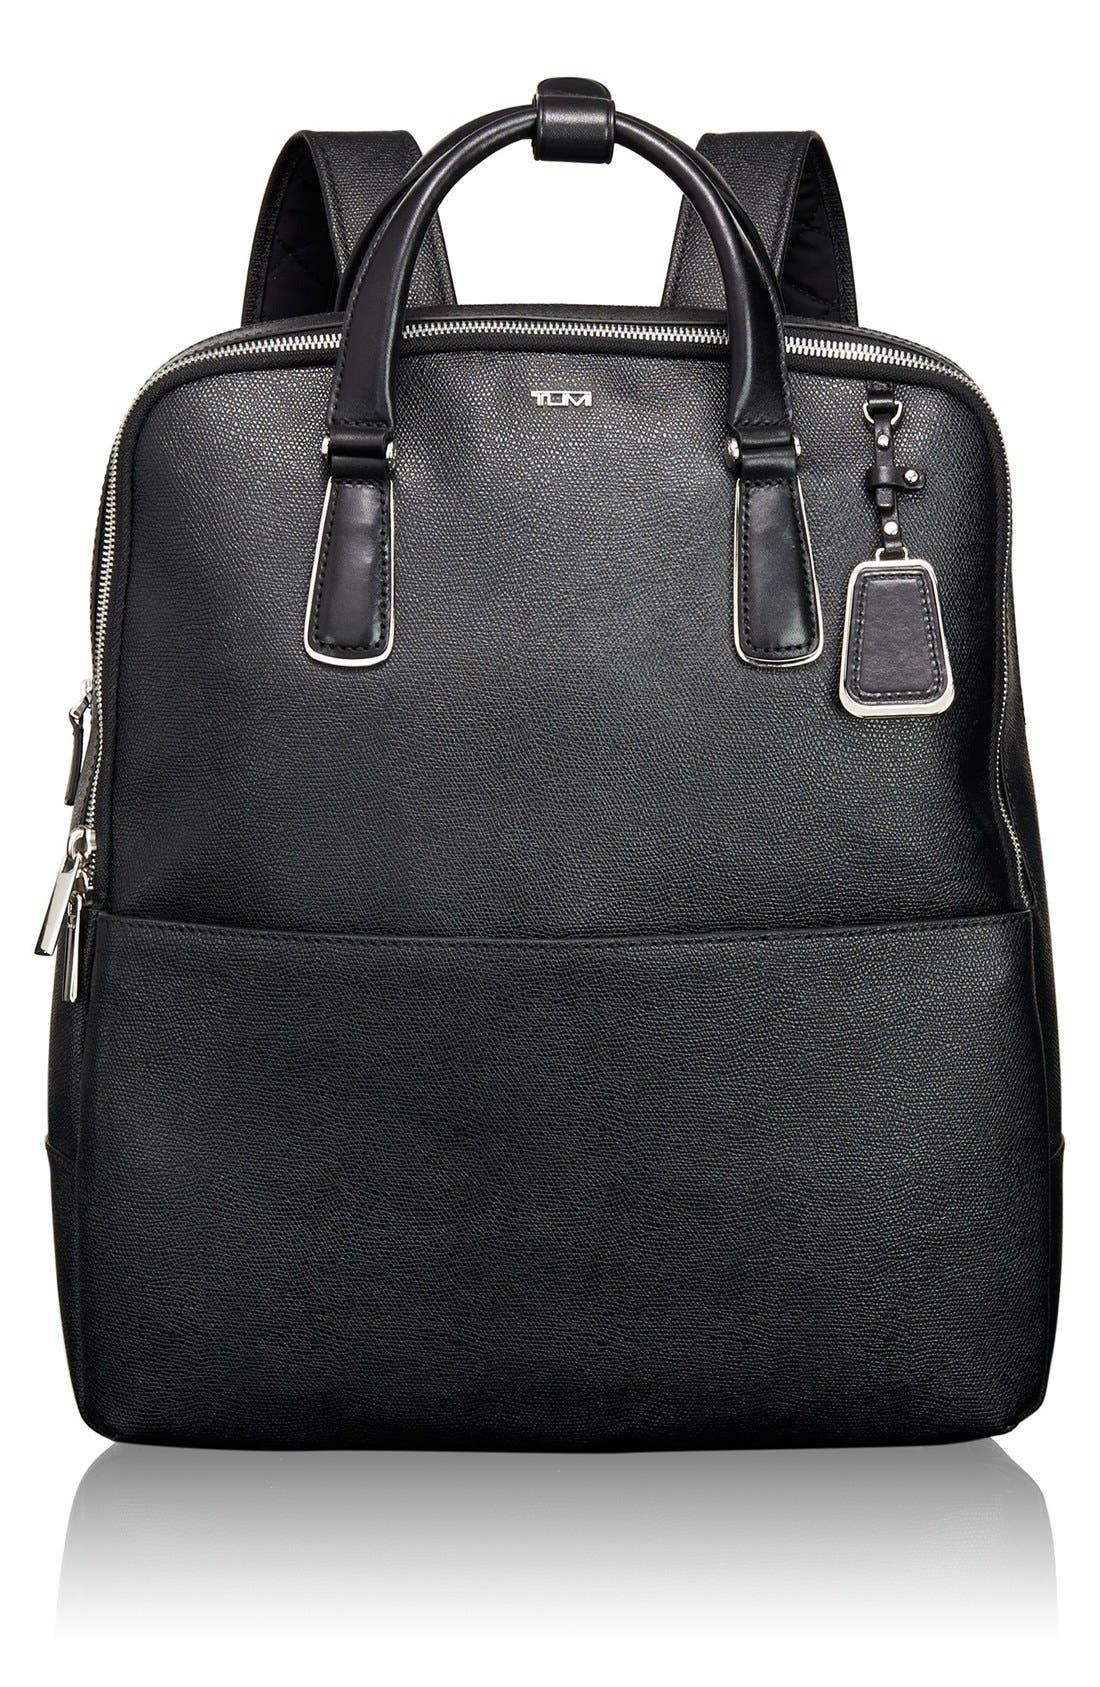 Alternate Image 1 Selected - Tumi Sinclair -Olivia Convertible Backpack